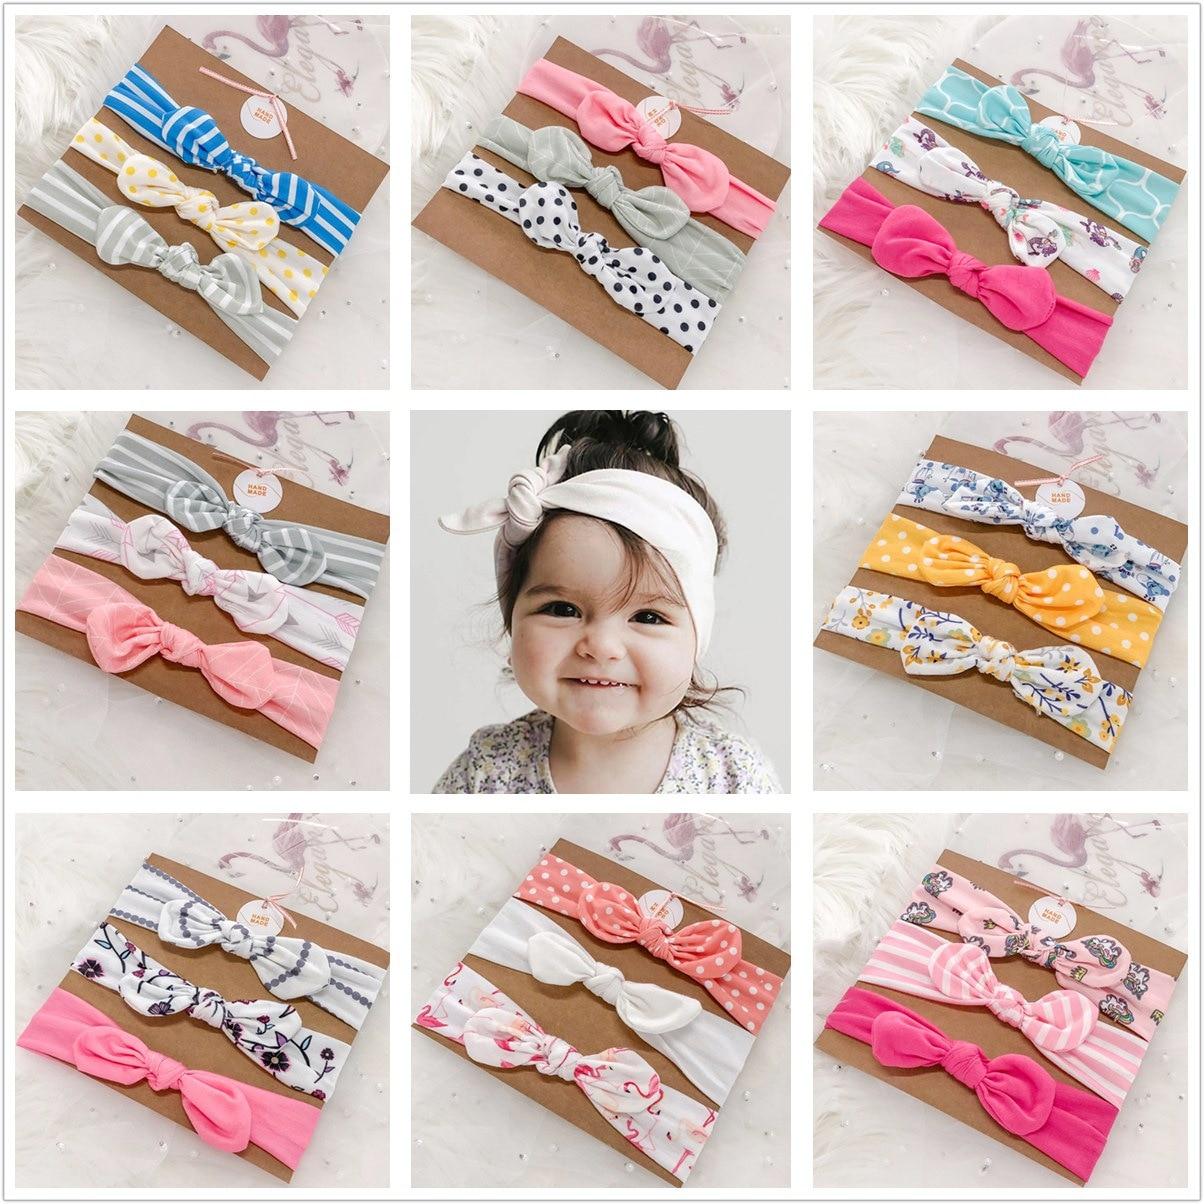 3Pcs/lot Baby Girl Headband For Newborn Babies Hair Band Elastic Accessories Cotton Headwear  Baby Nylon Headband